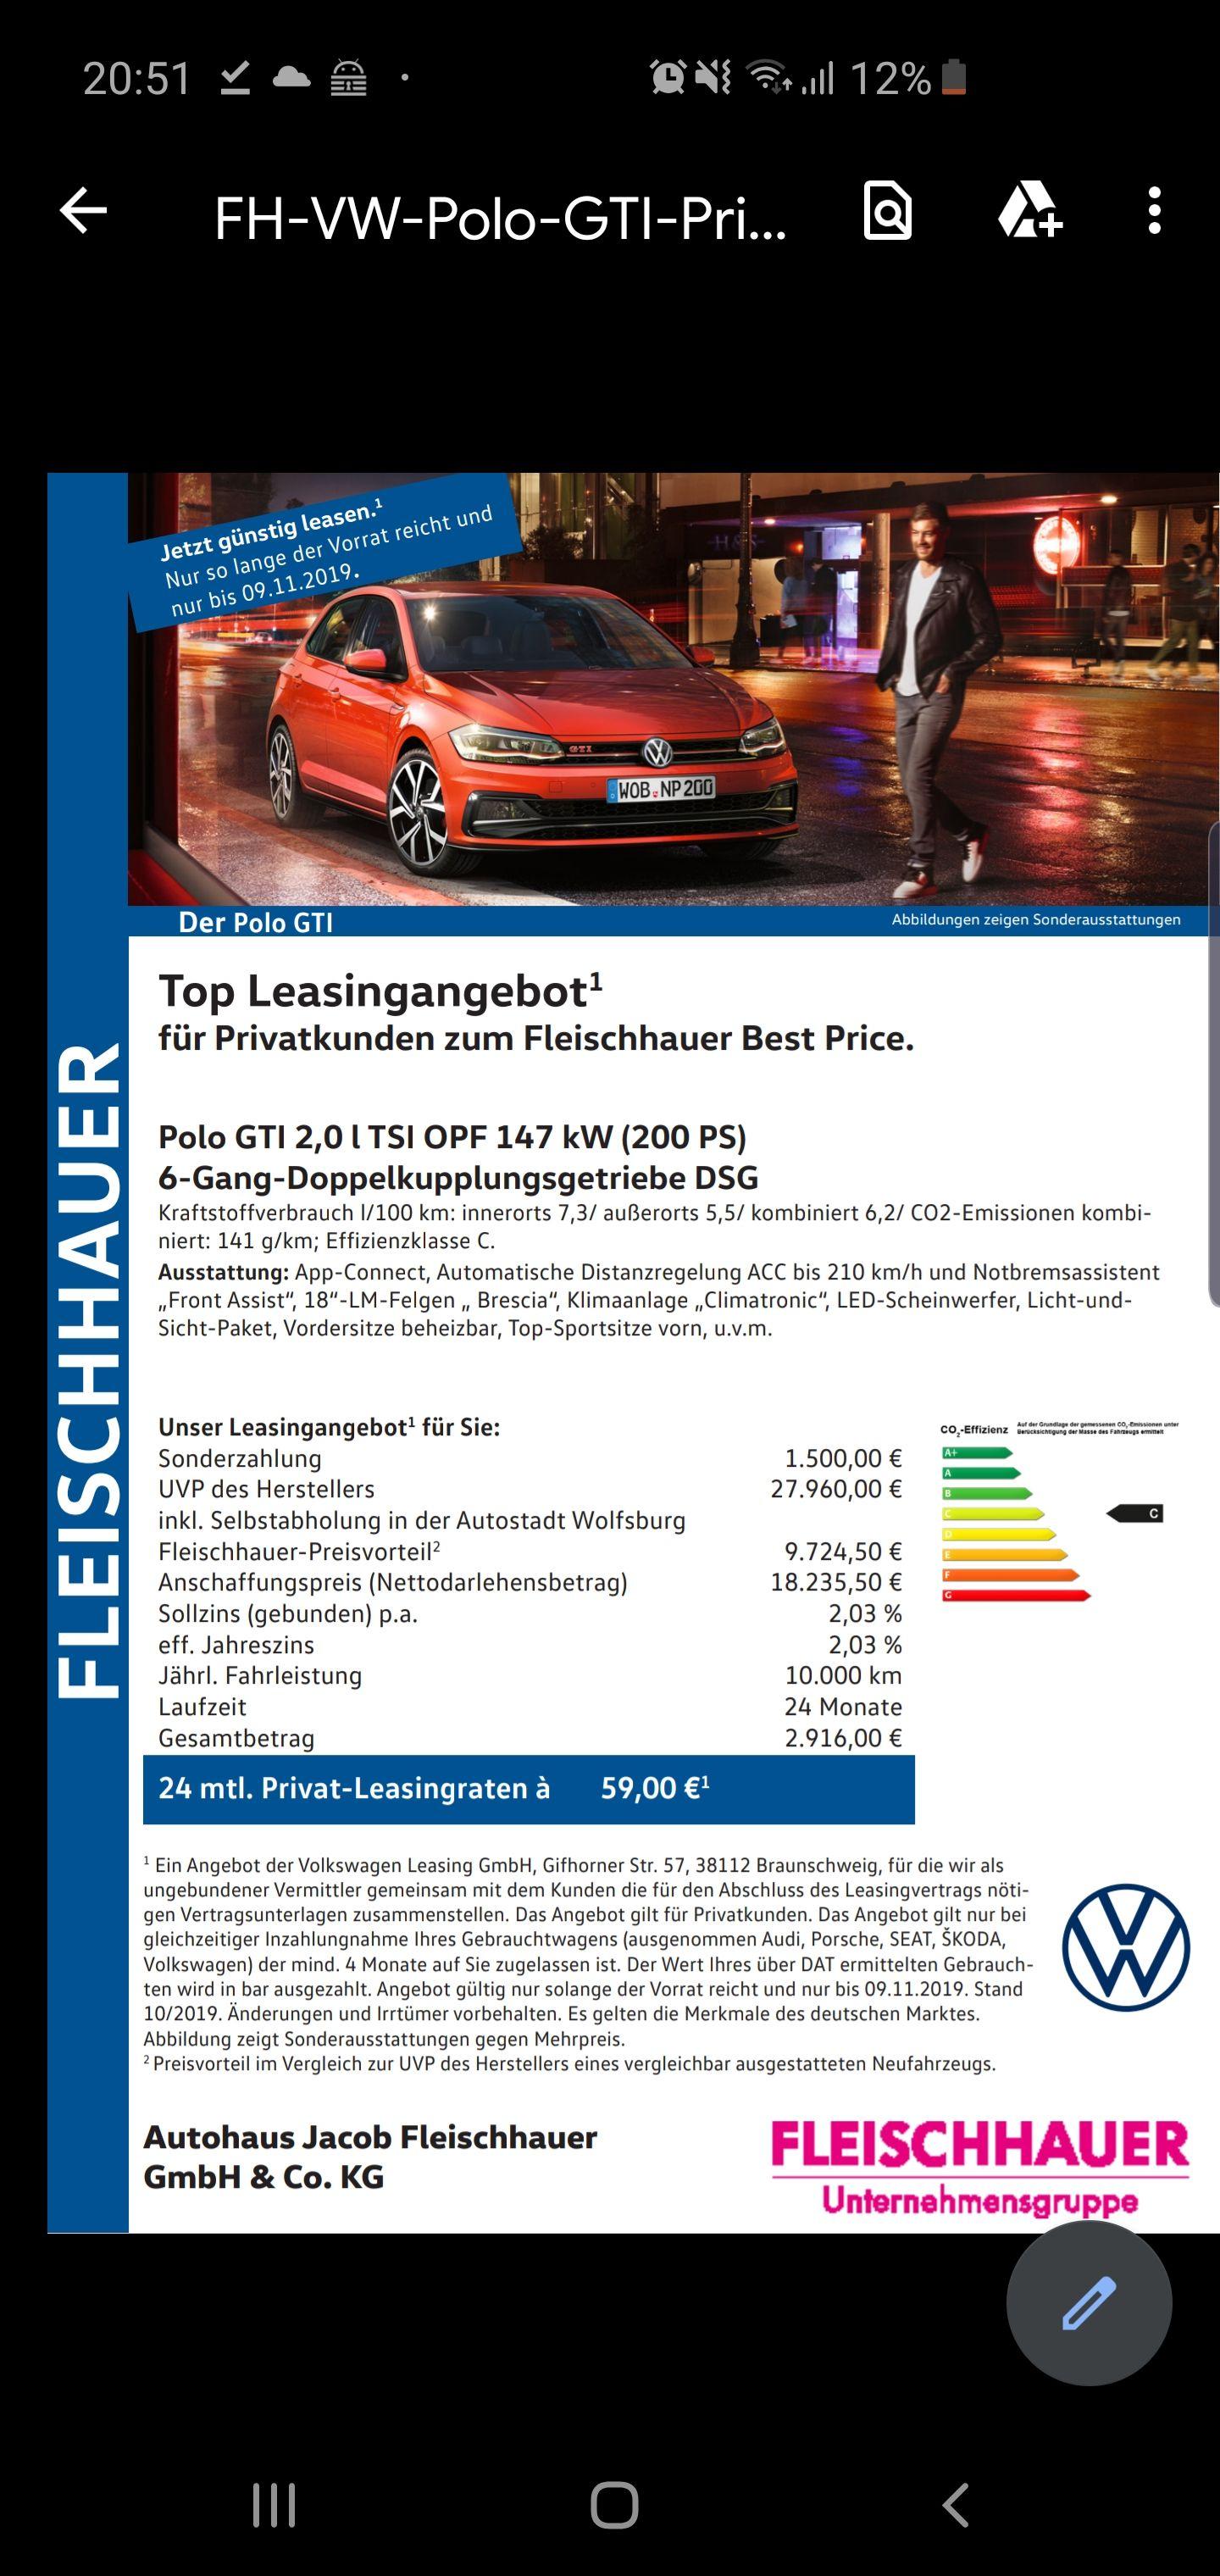 VW Polo GTI - Privatkunden Lsasing - Leasingfaktor 0,43 - Anzahlung/Inzahlungnahme notwendig